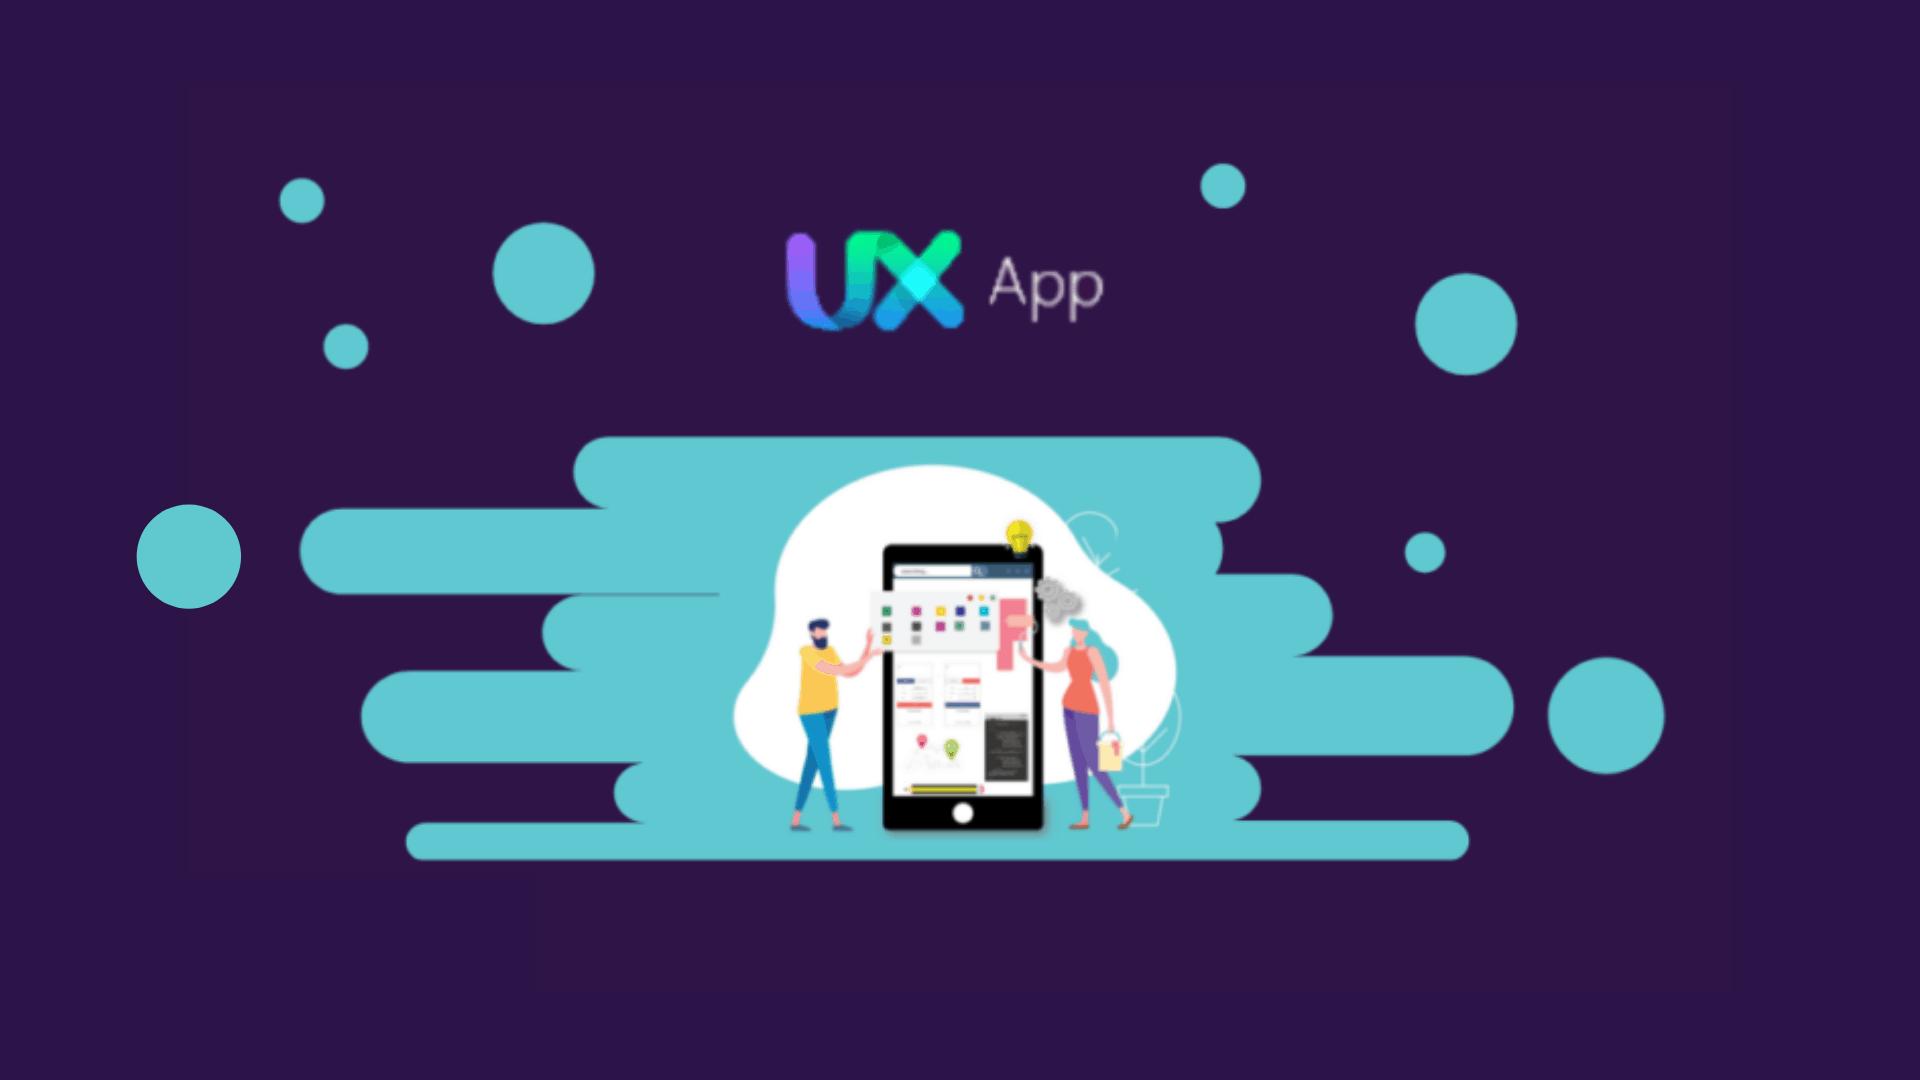 UX-App lifetime deal grabltd